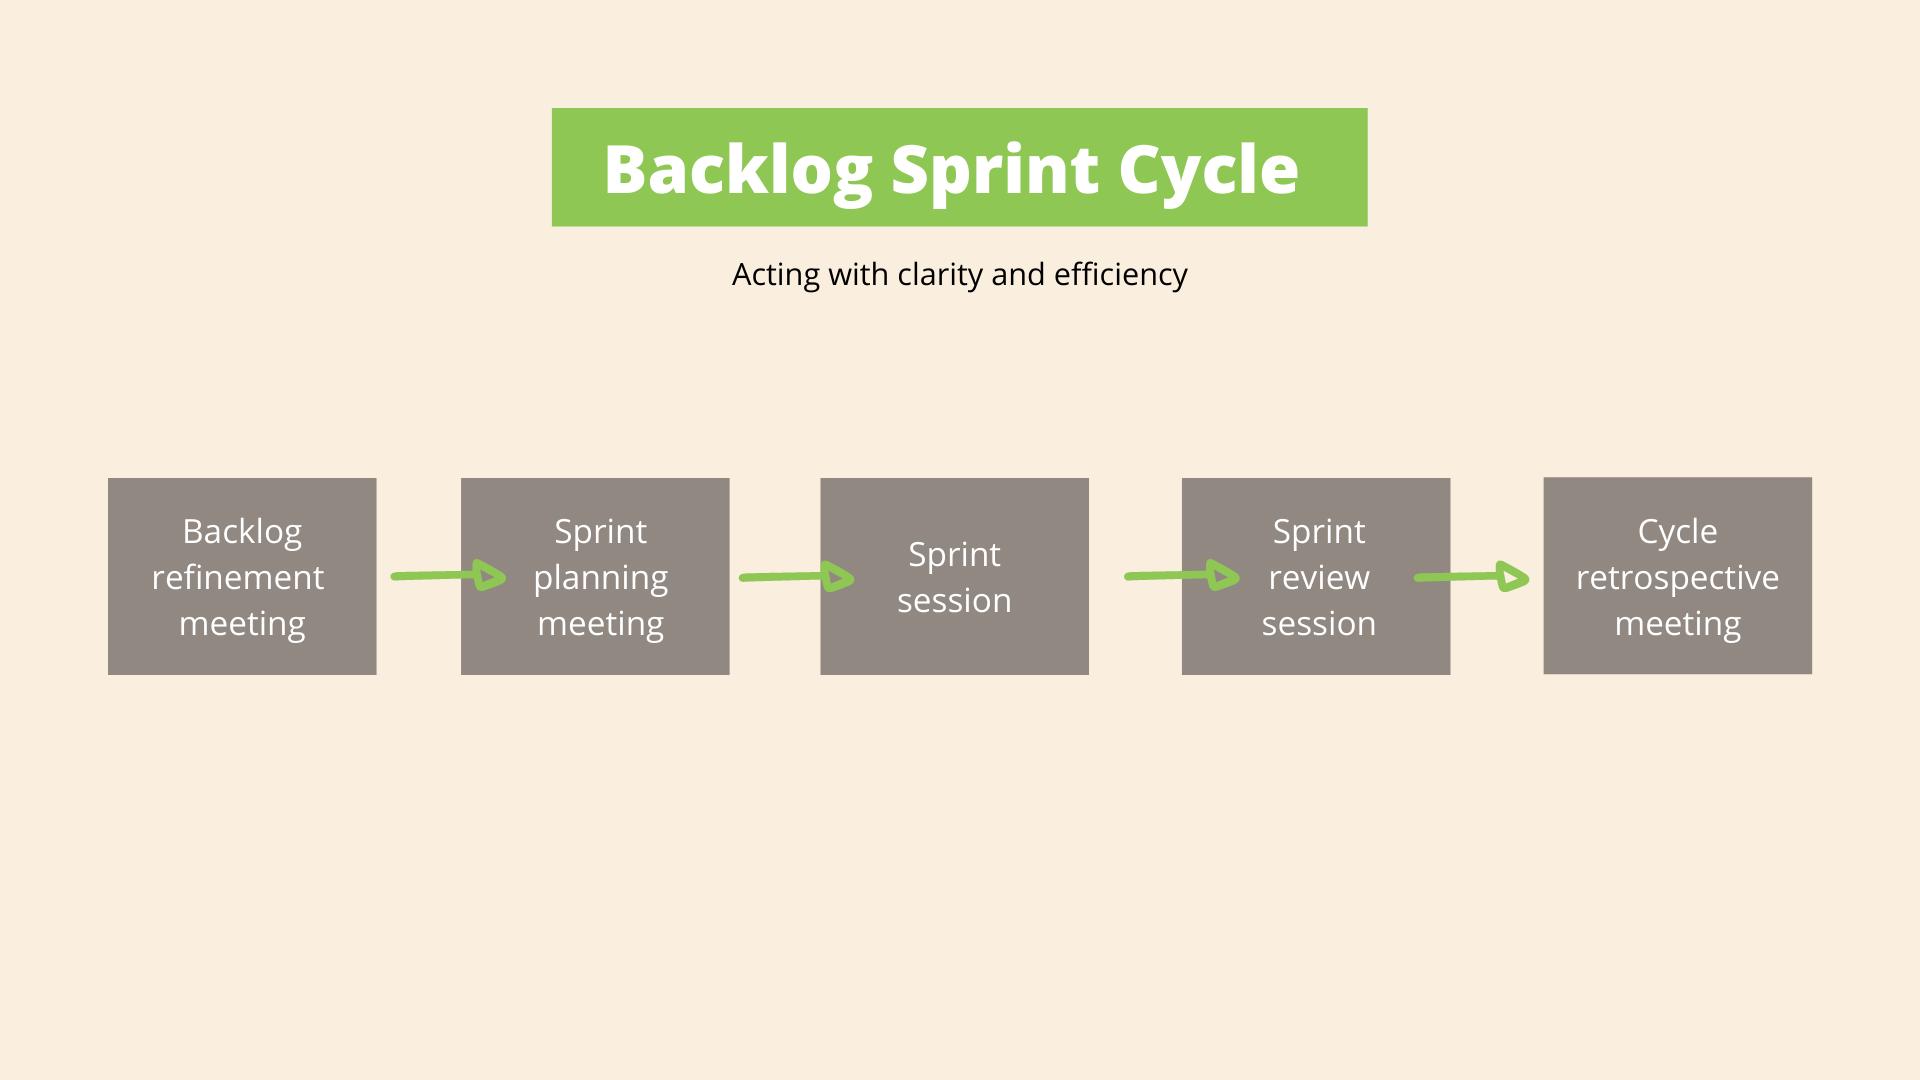 Product backlog sprints